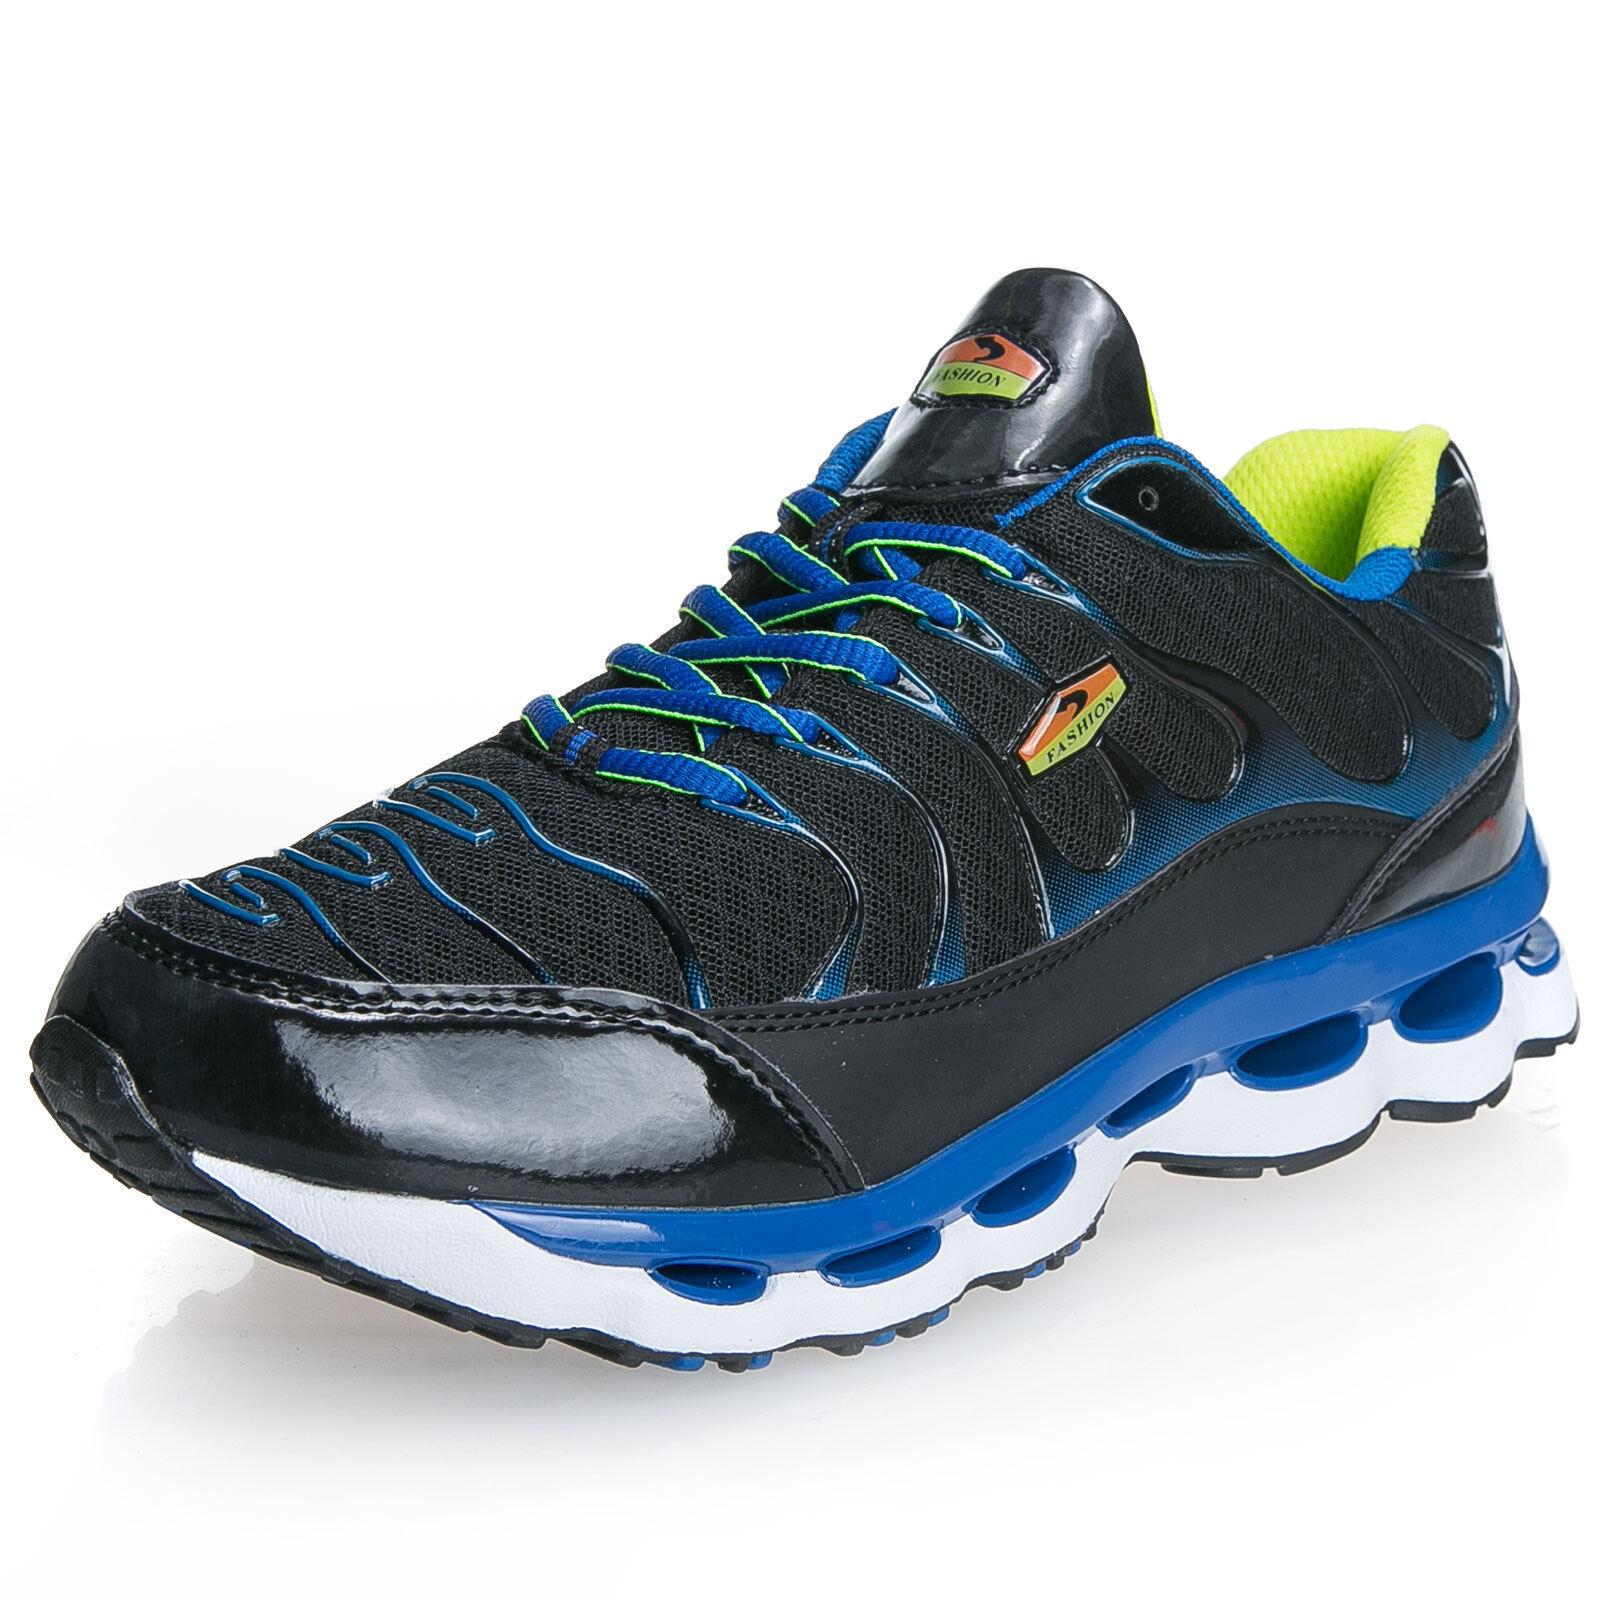 scarpe da ginnastica uomo running fitness sport sportive palestra corsa 9127